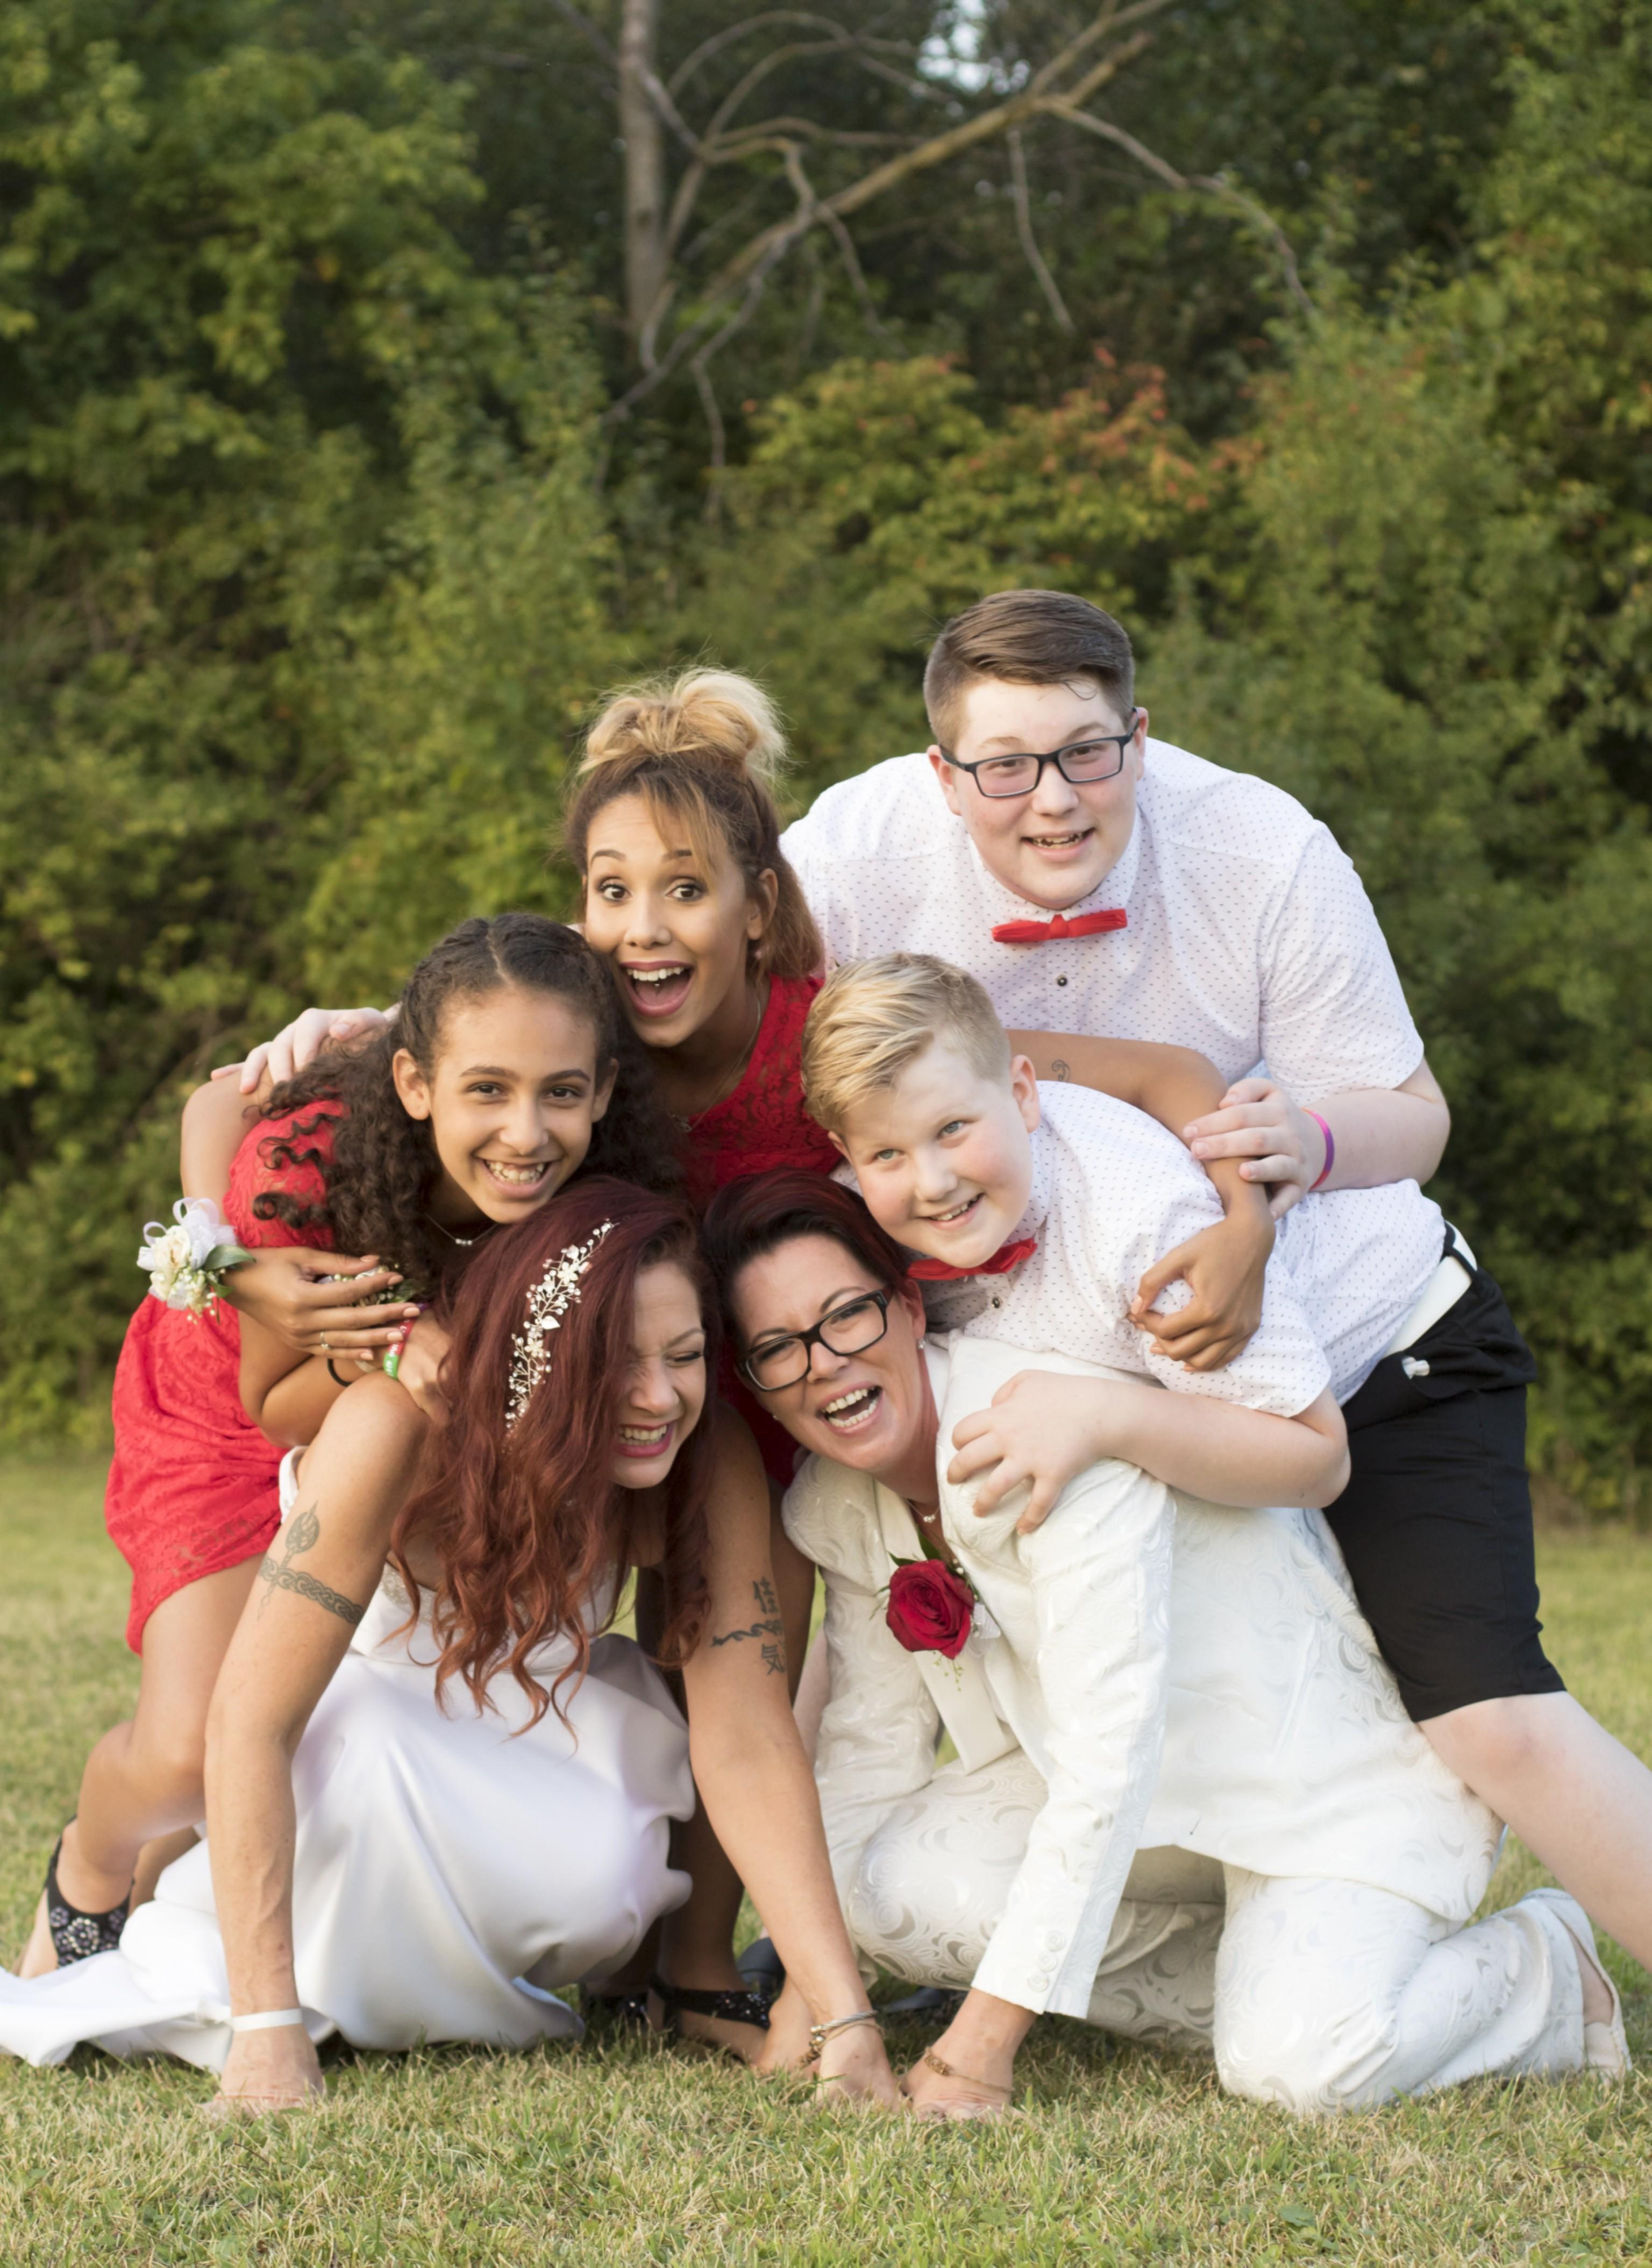 Natasha, Melissa, with Jasmin, Dakota, Thea, Darrin